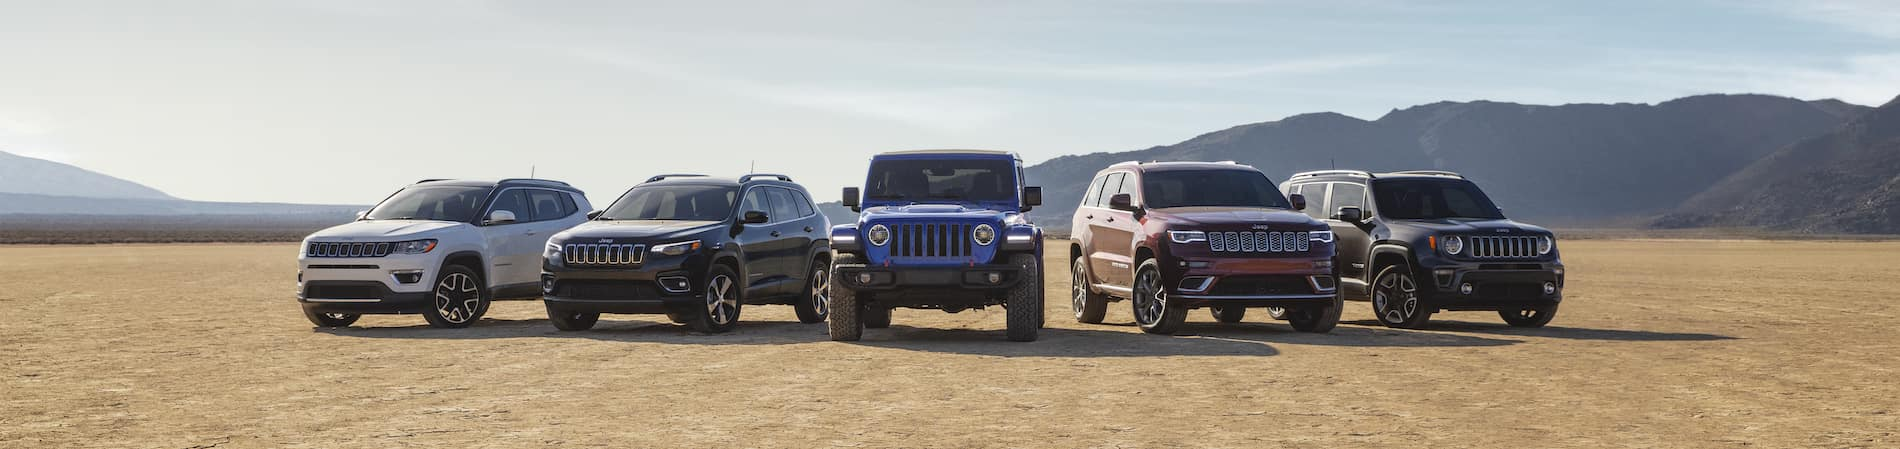 Jeep Models Line Up